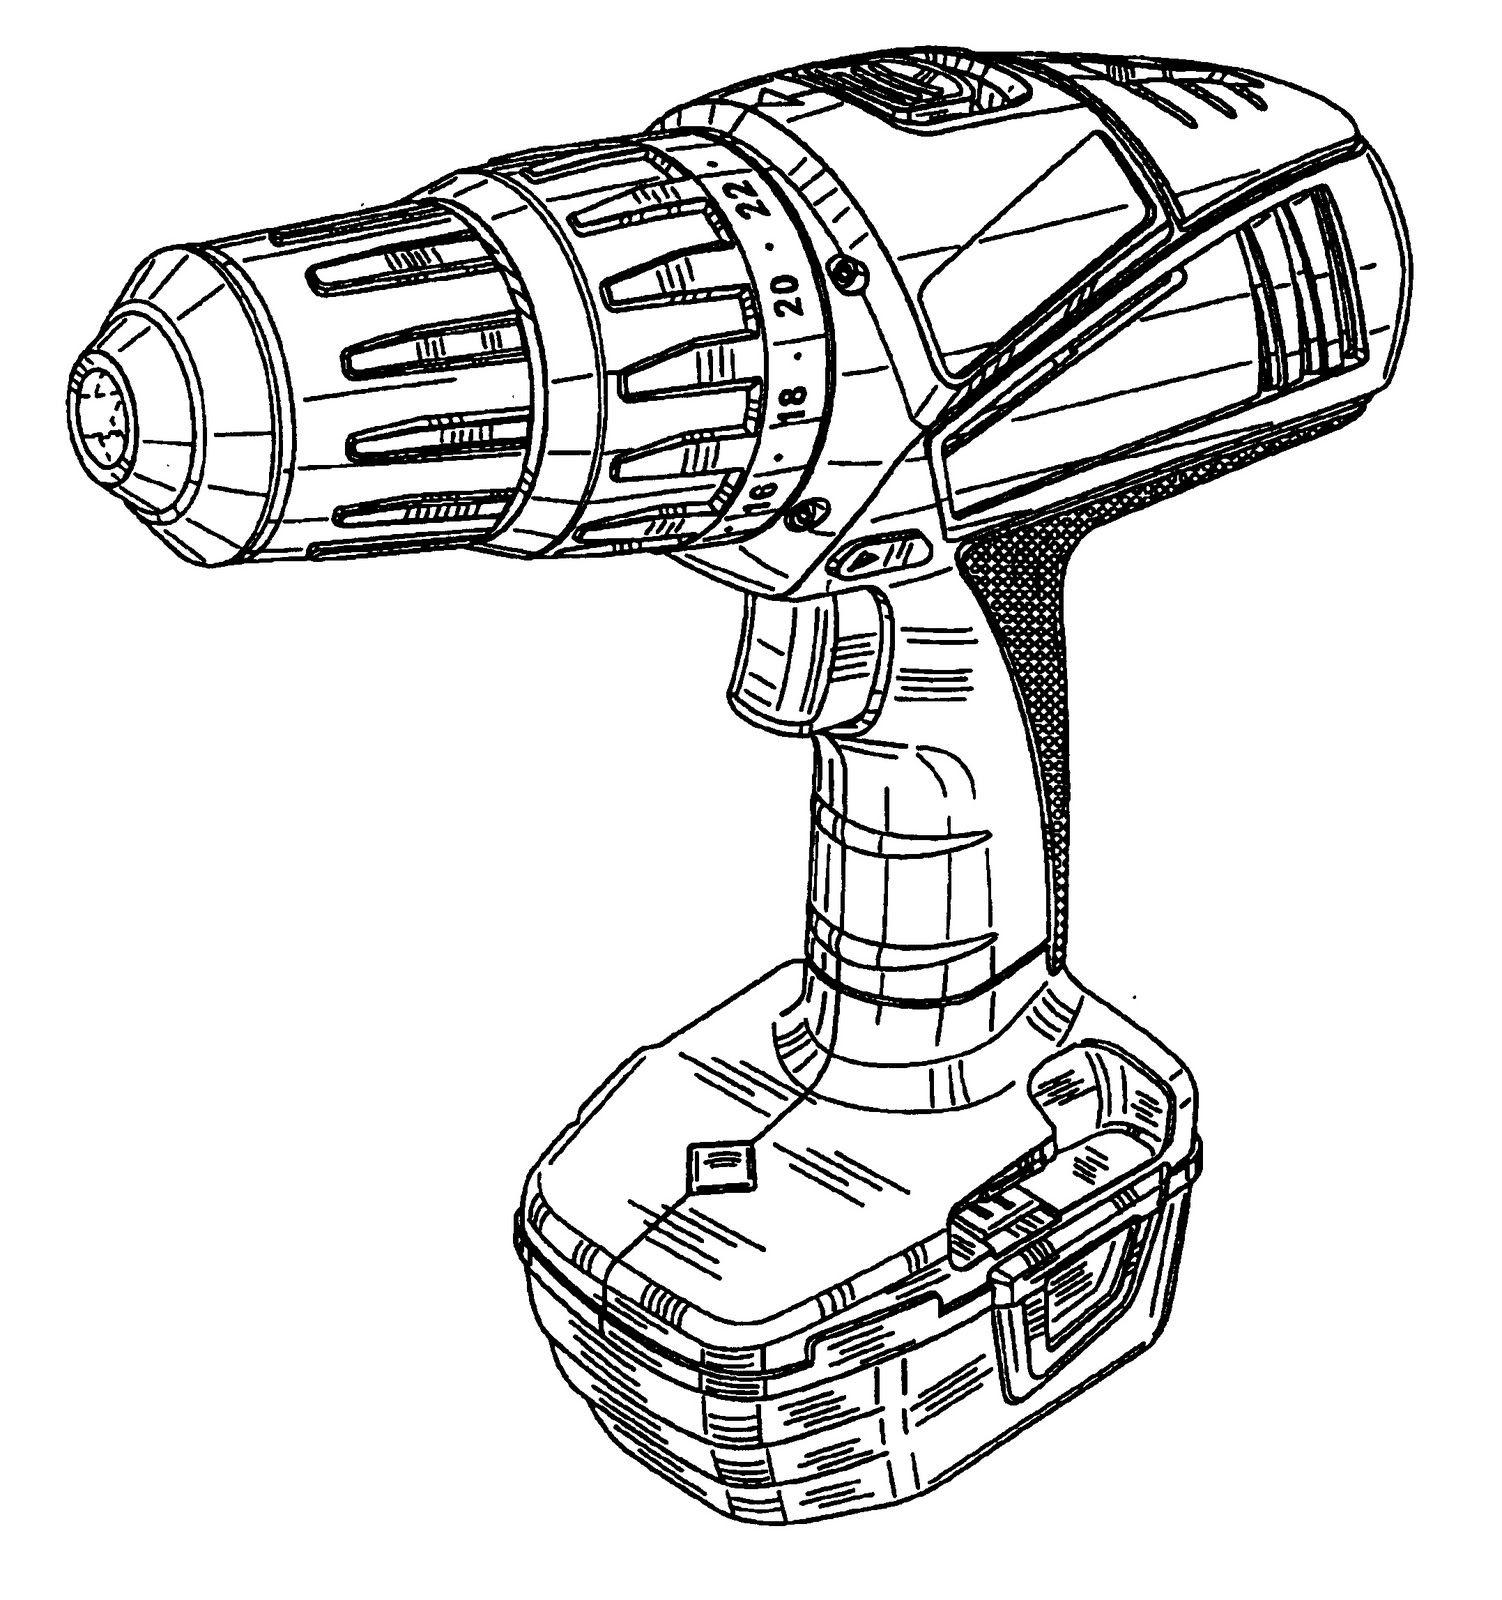 Task Lighting Wiring Diagram, Task, Free Engine Image For